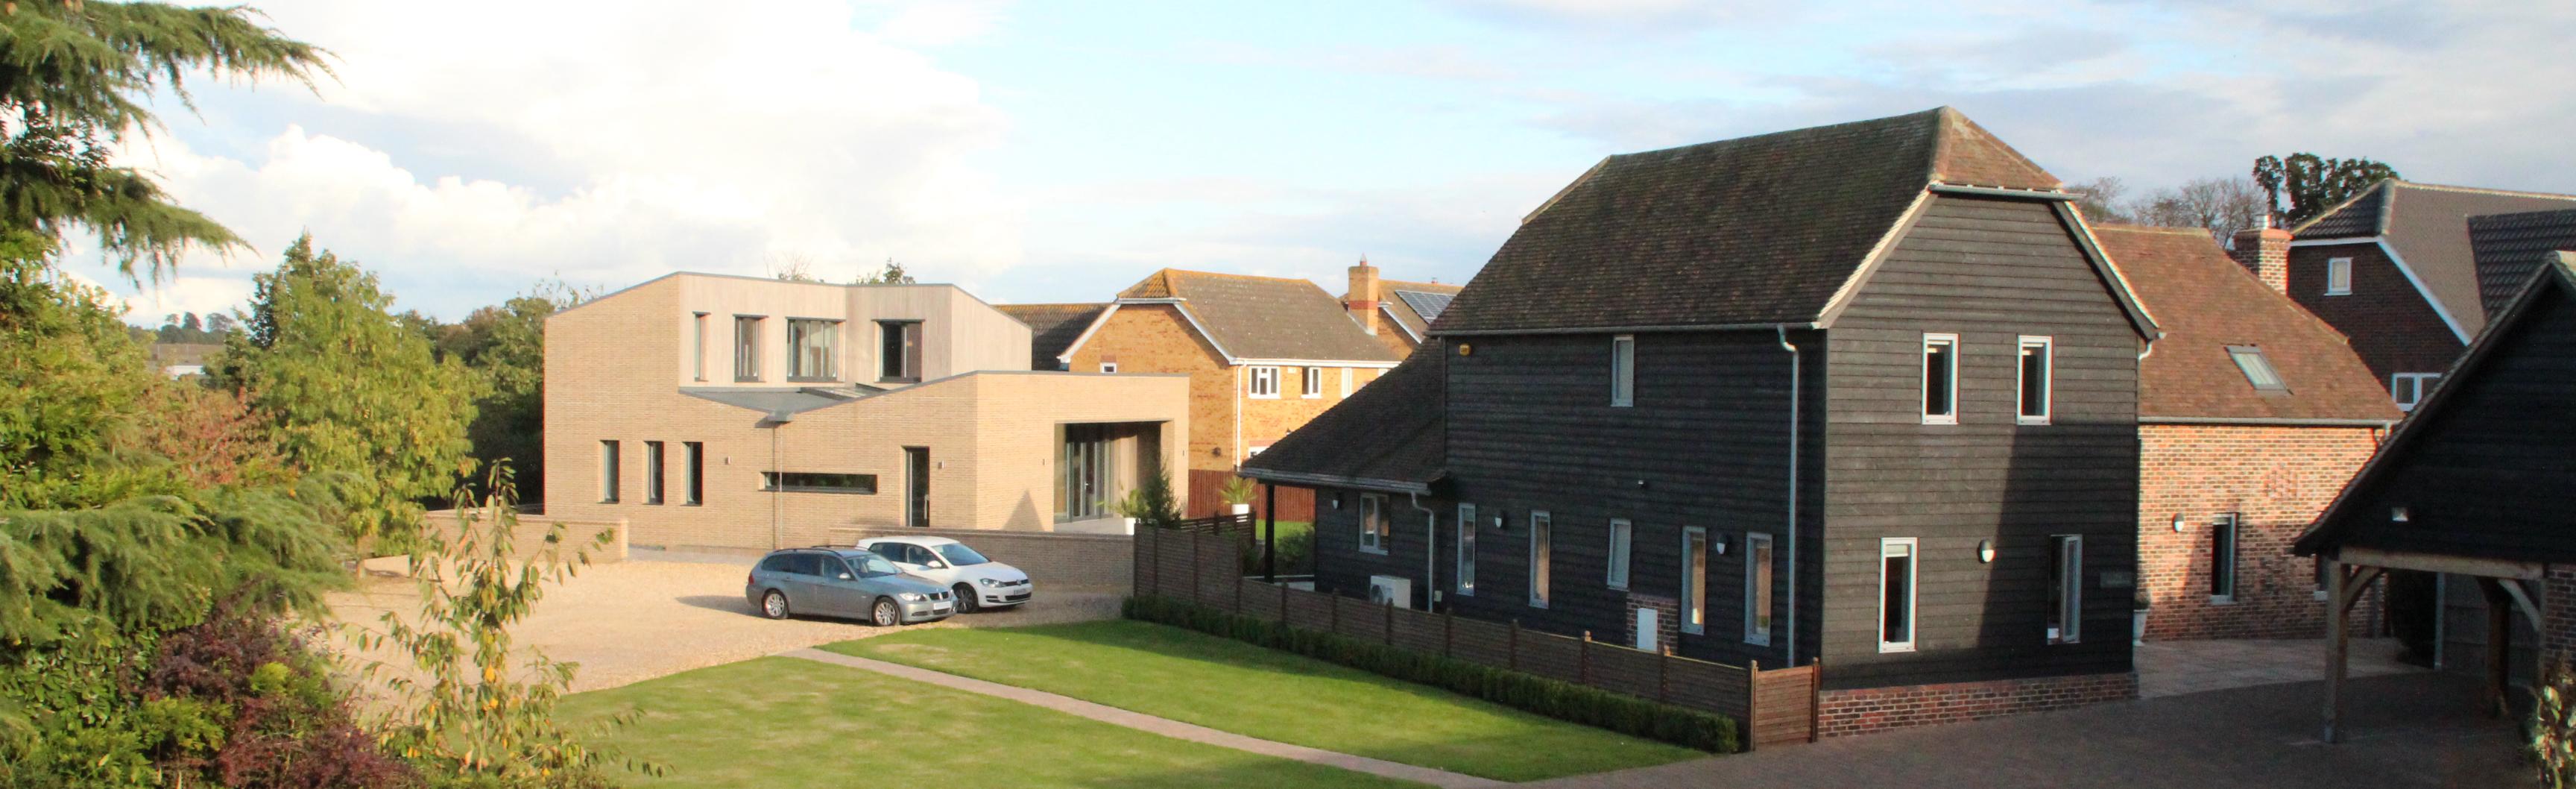 Potton Passivhaus